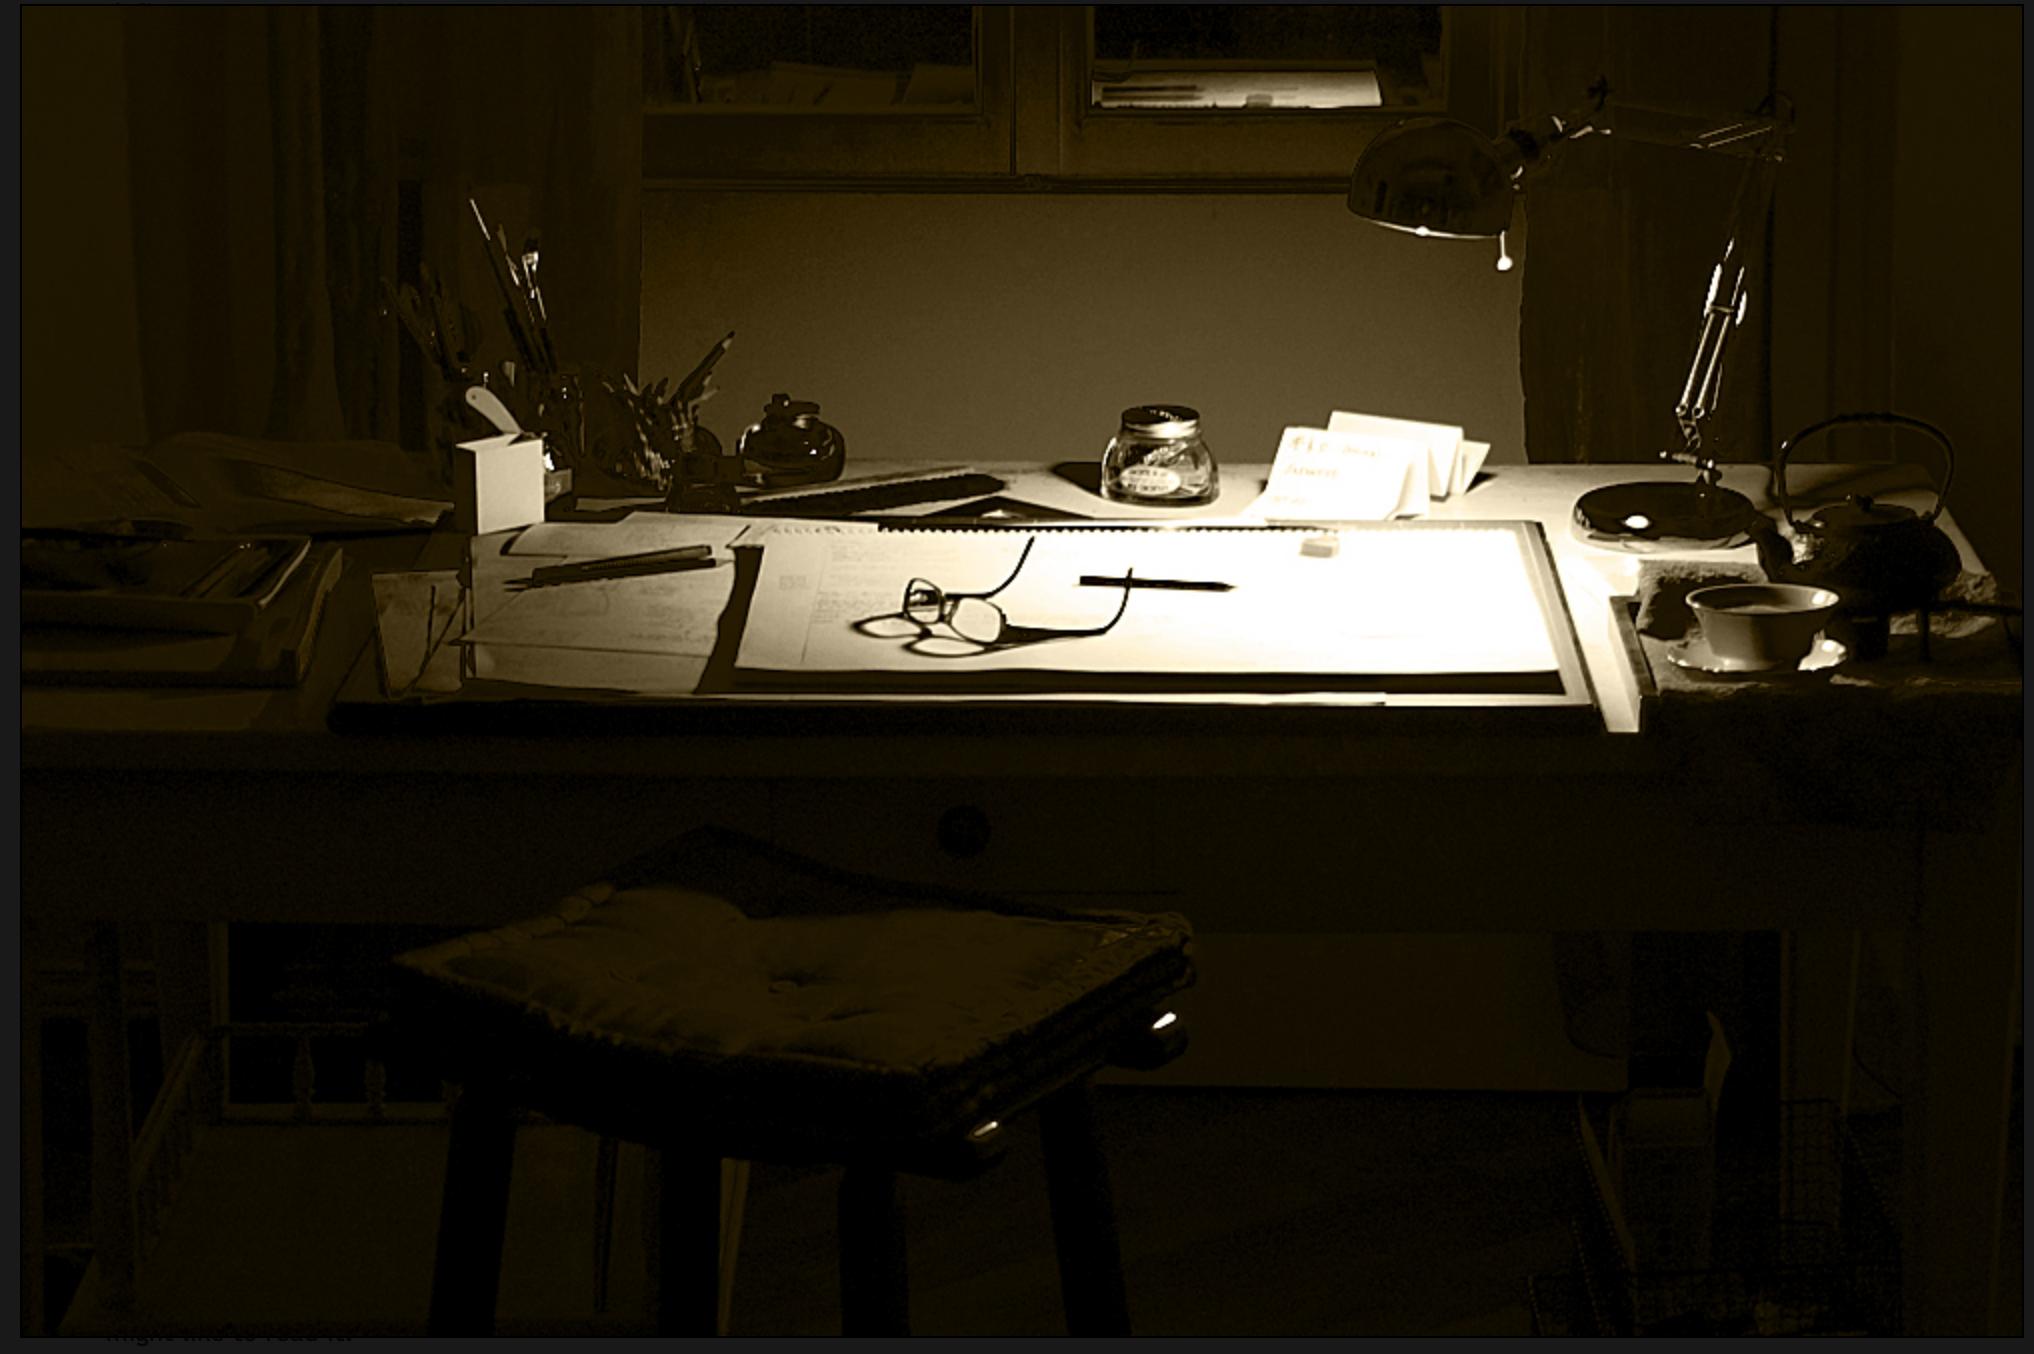 studio milledisegni - my desk.jpg